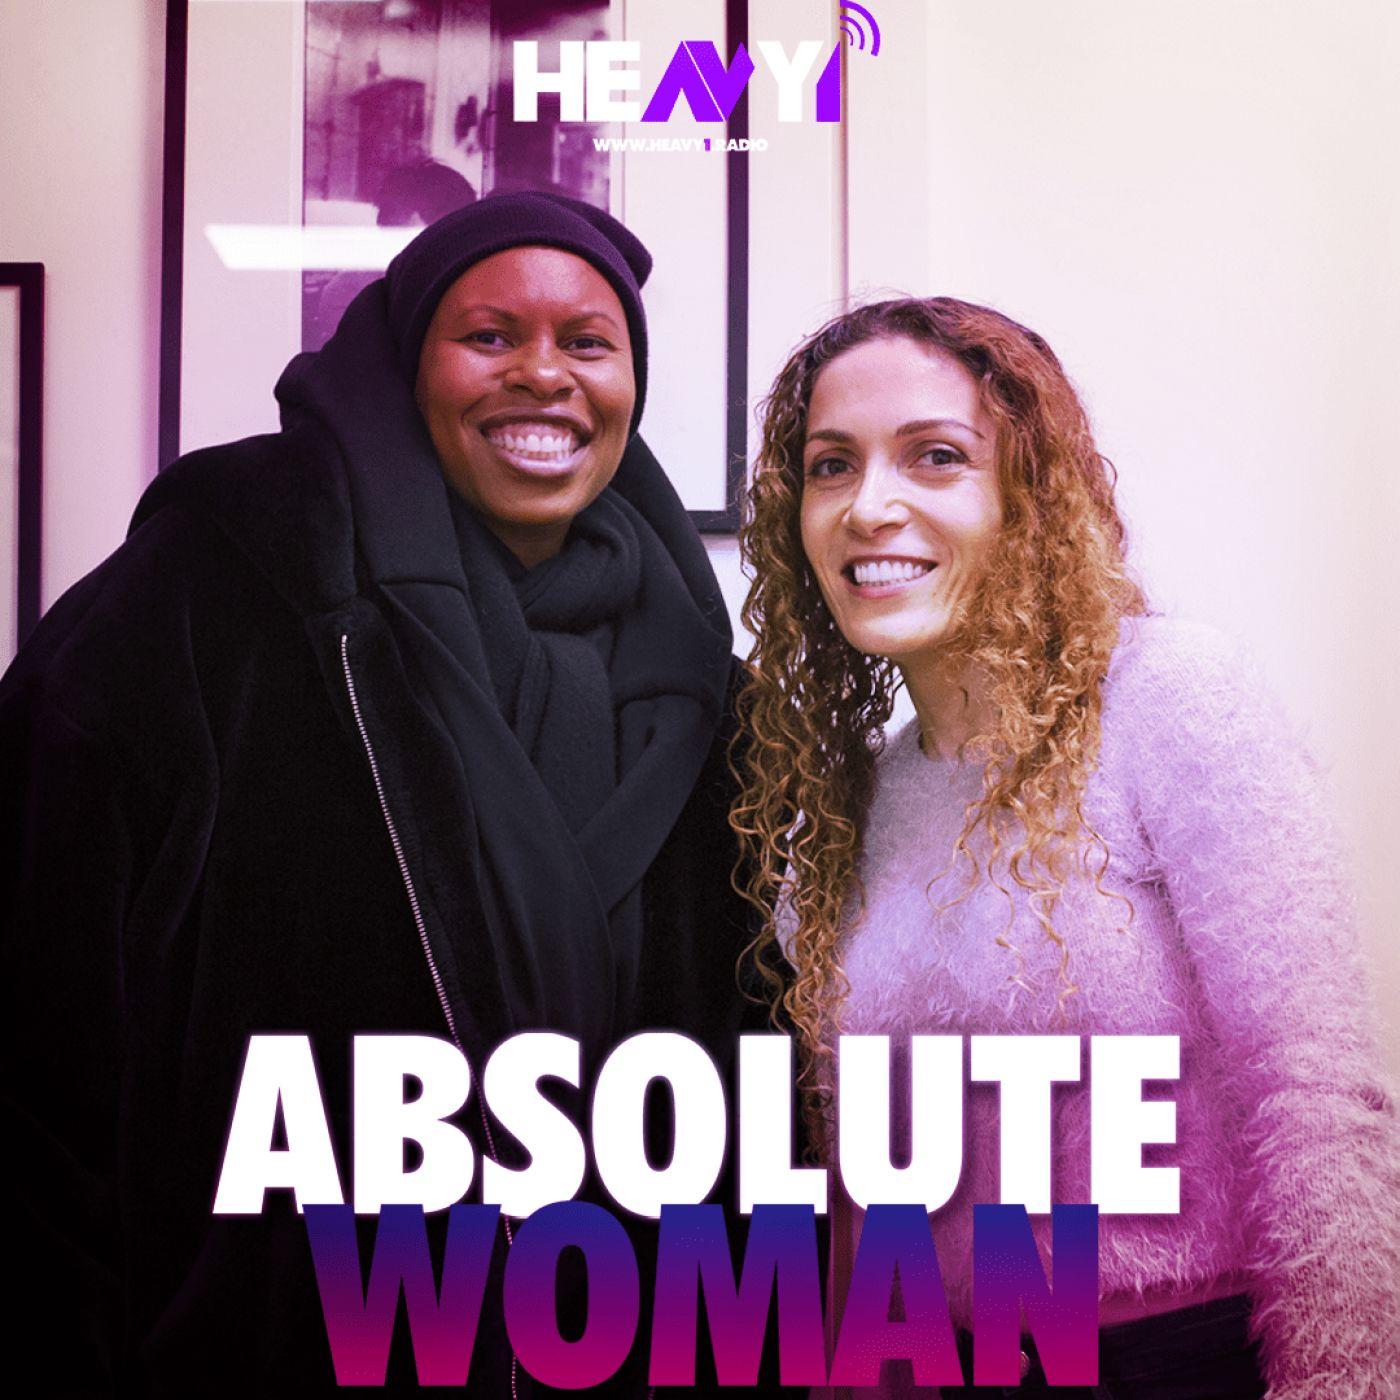 Absolute Woman : Skin • Skunk Anansie (Ep.6 Saison 2)